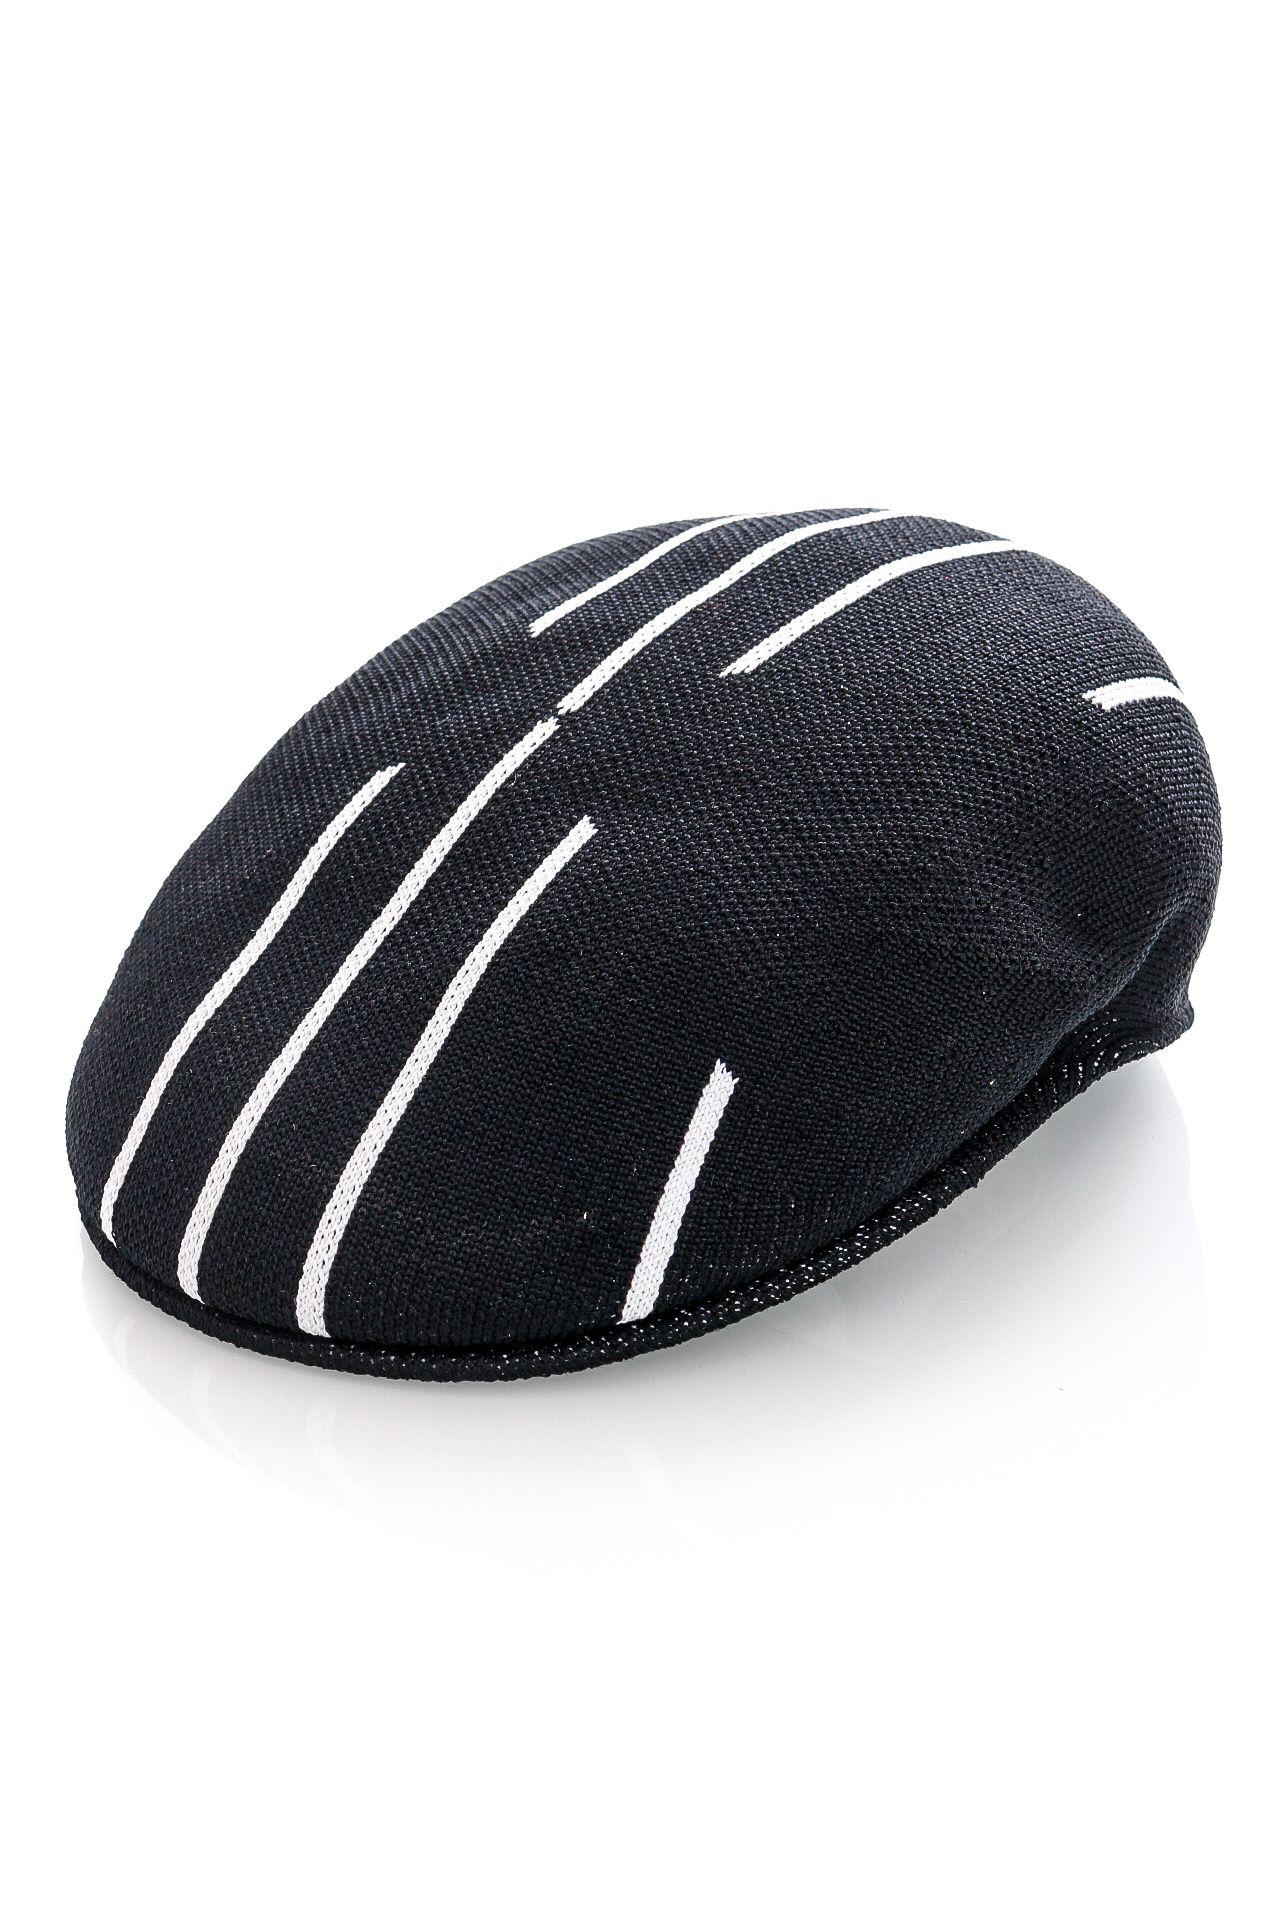 Afbeelding van Kangol Flat Cap Stripe X-Top 504 Black/White K4392